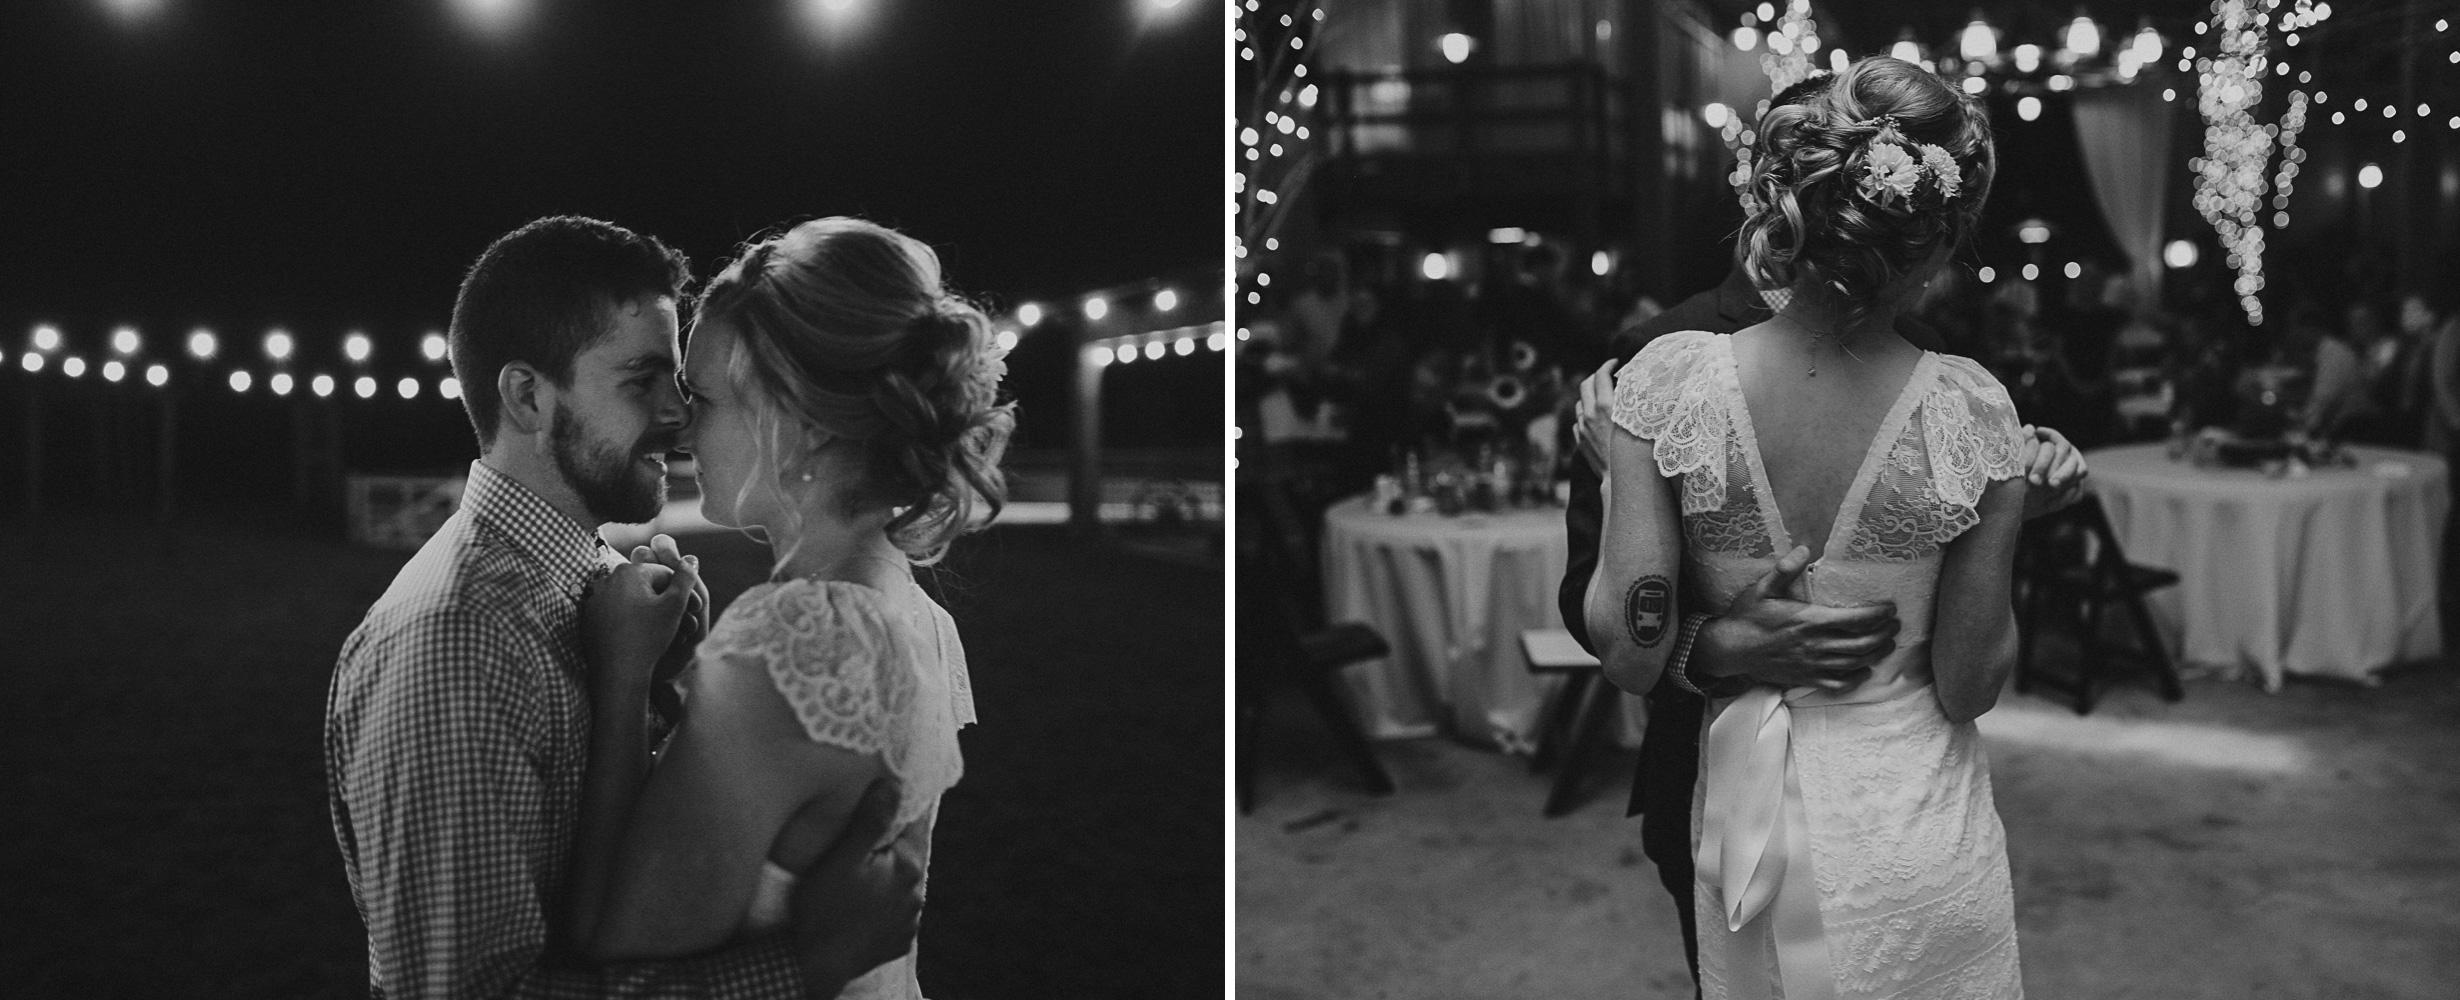 Salt-Lake-City-Wedding-Photographer-Utah-017.jpg